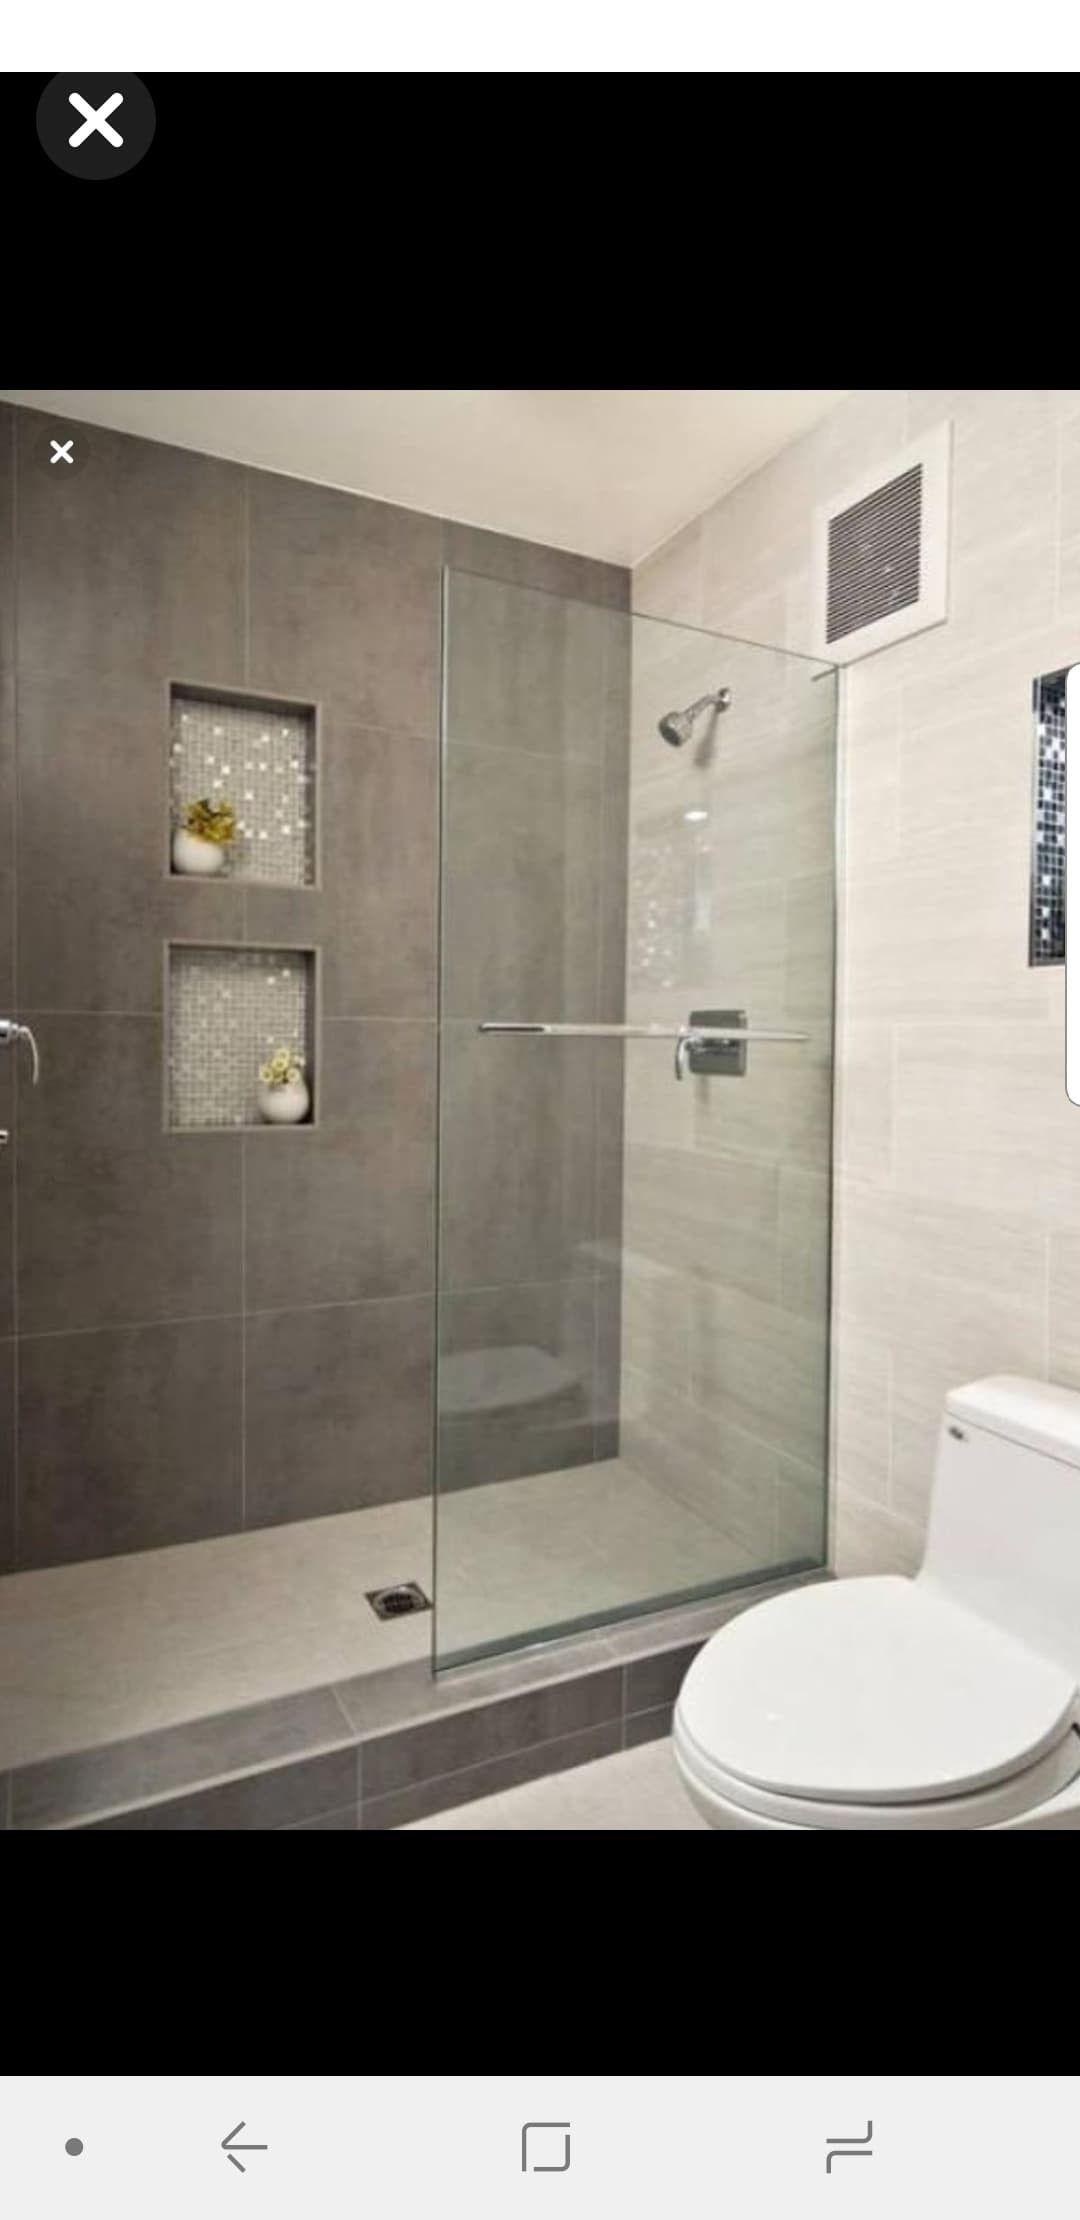 Shower Remodel Remodel Bathroom Modern Small Bathrooms Small Bathroom Designs Modern Bathroom